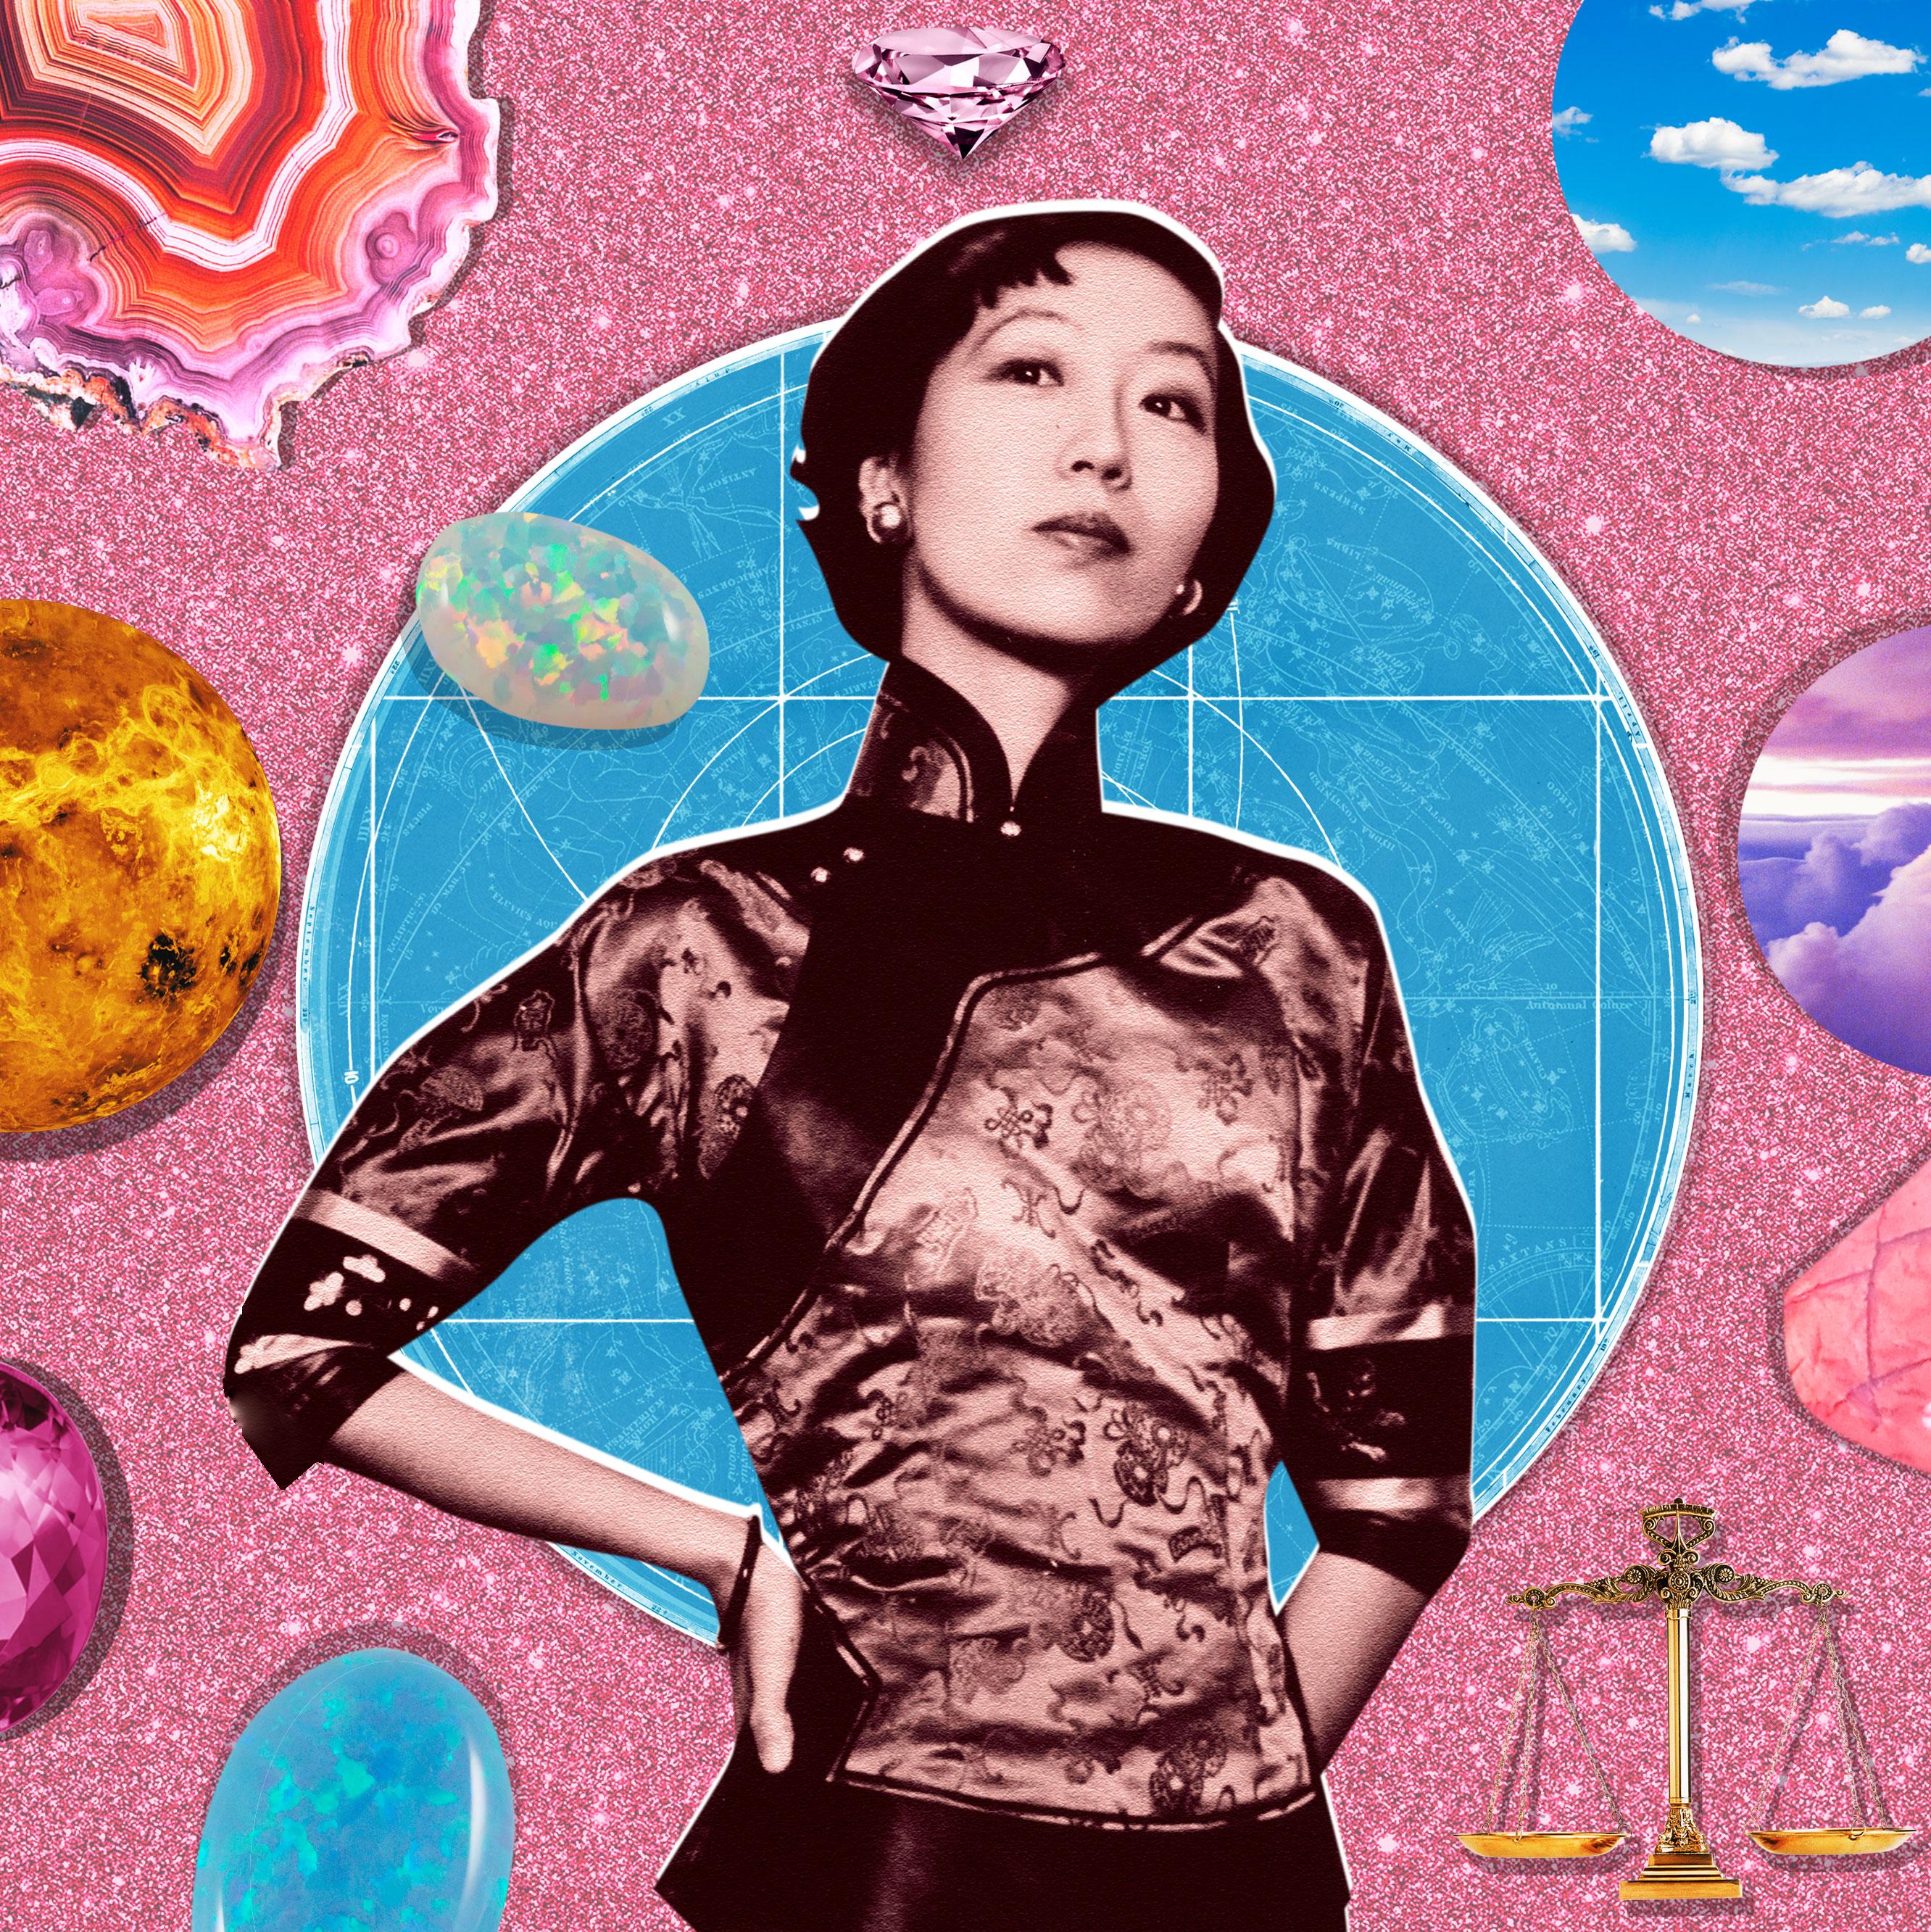 Madame Clairevoyant: Horoscopes for the Week of September 23